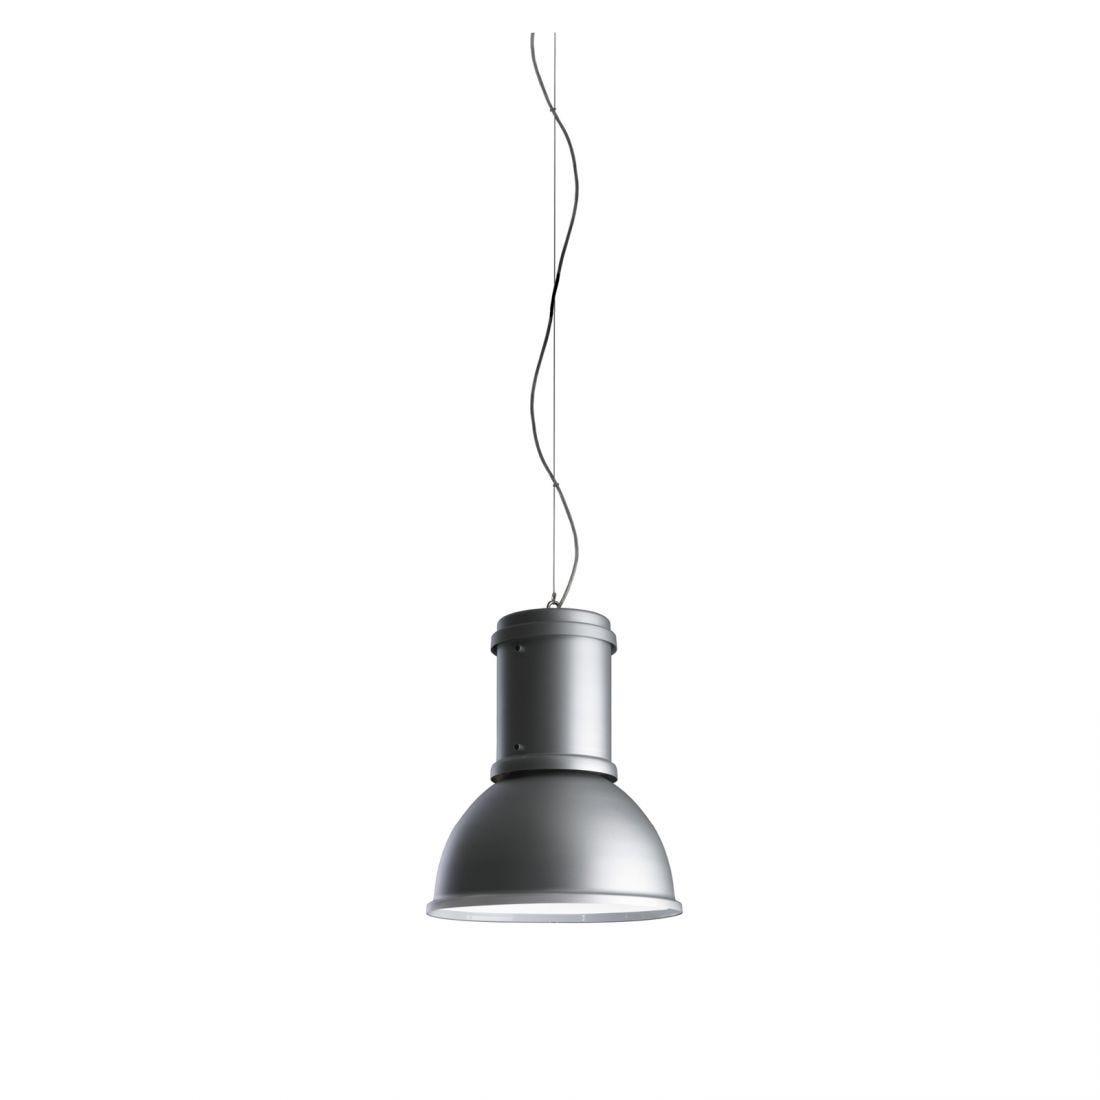 Fontana Arte Lampara Small Hanglamp